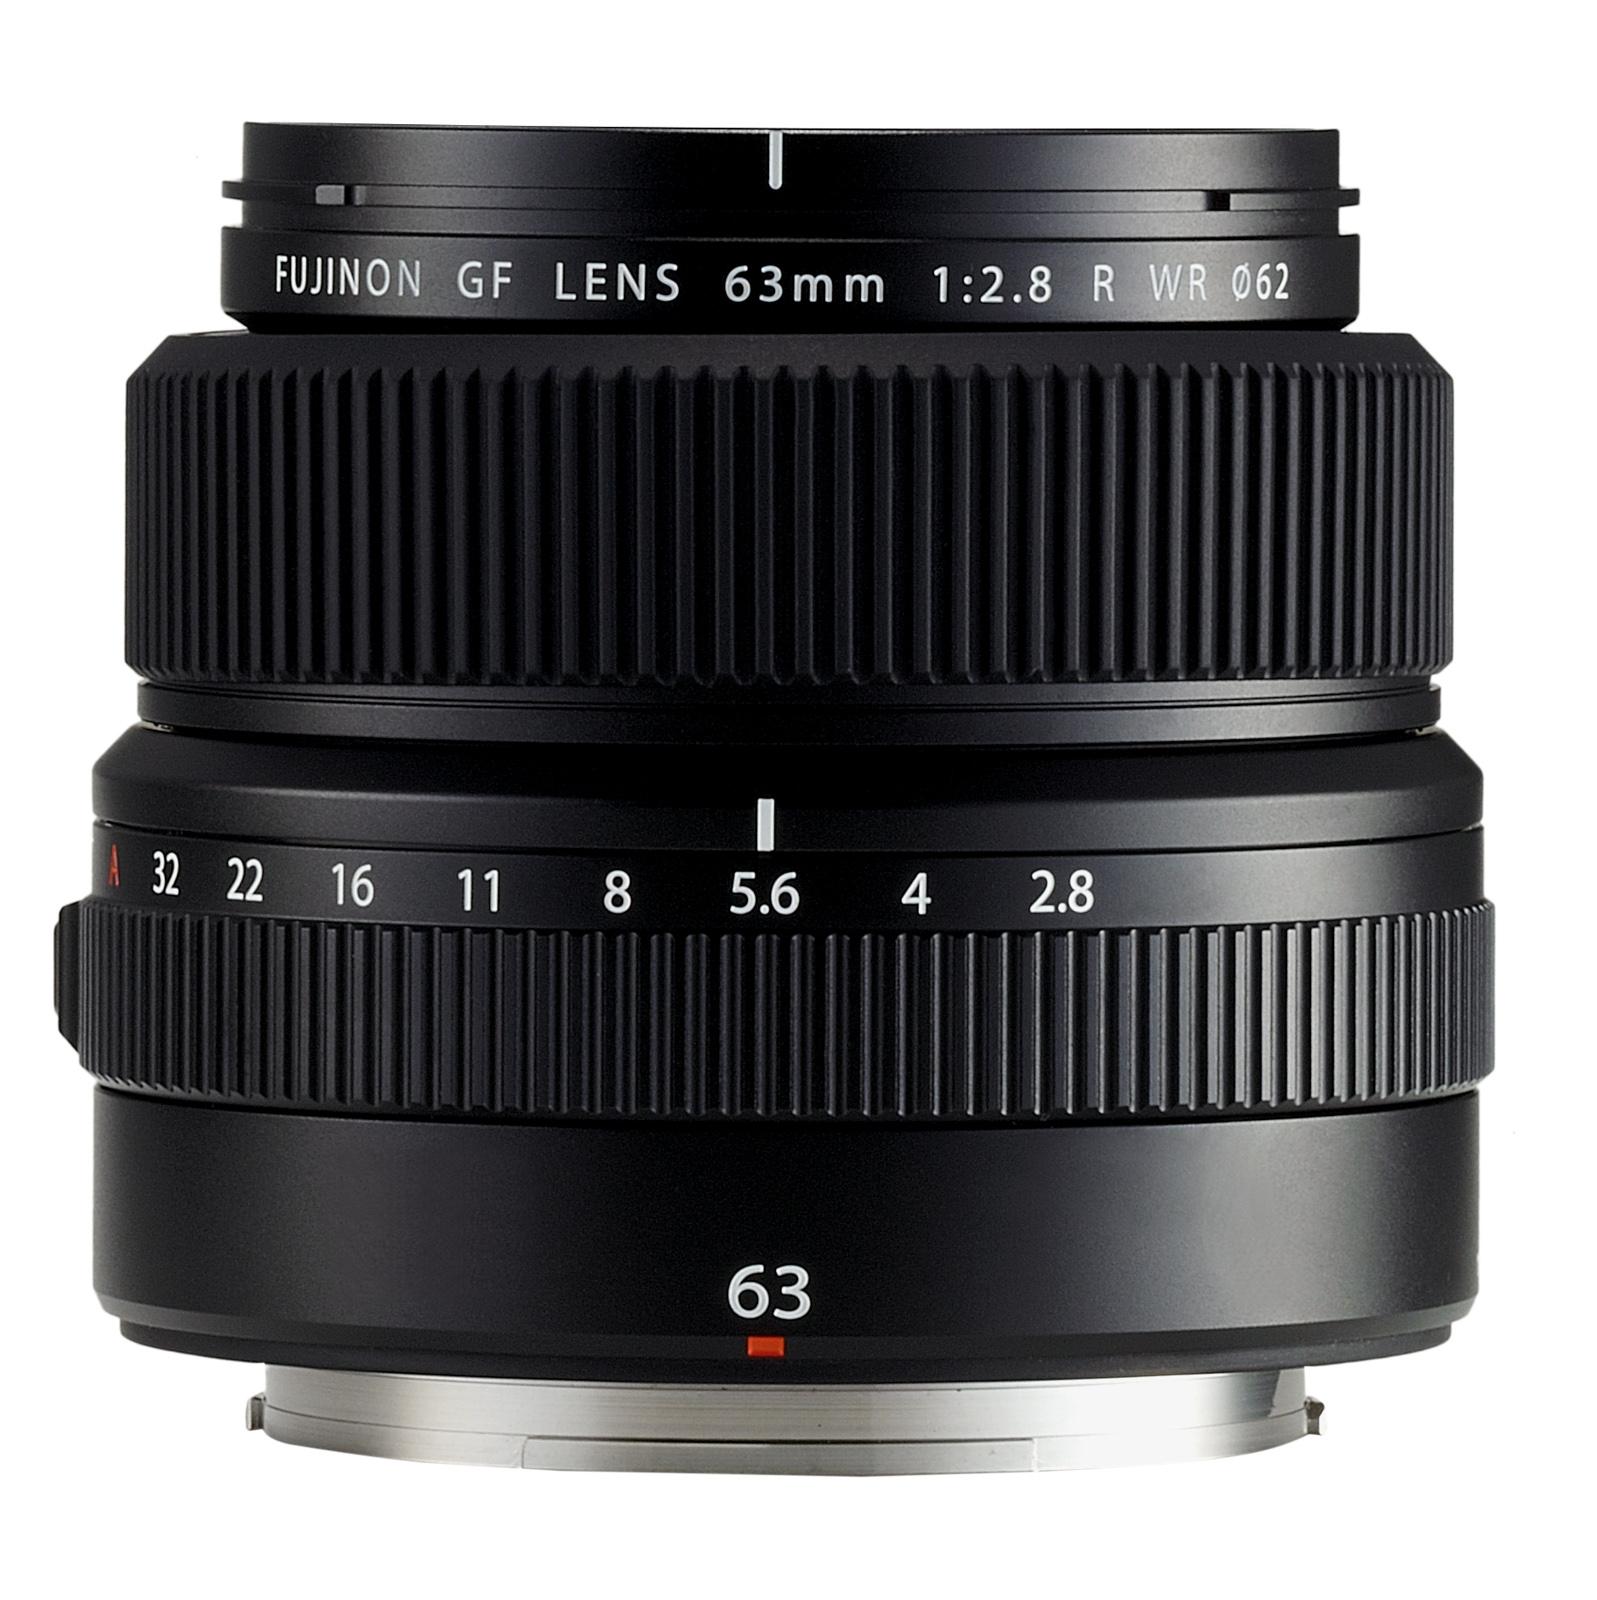 Fujifilm Fujinon GF 63mm f/2.8 R WR